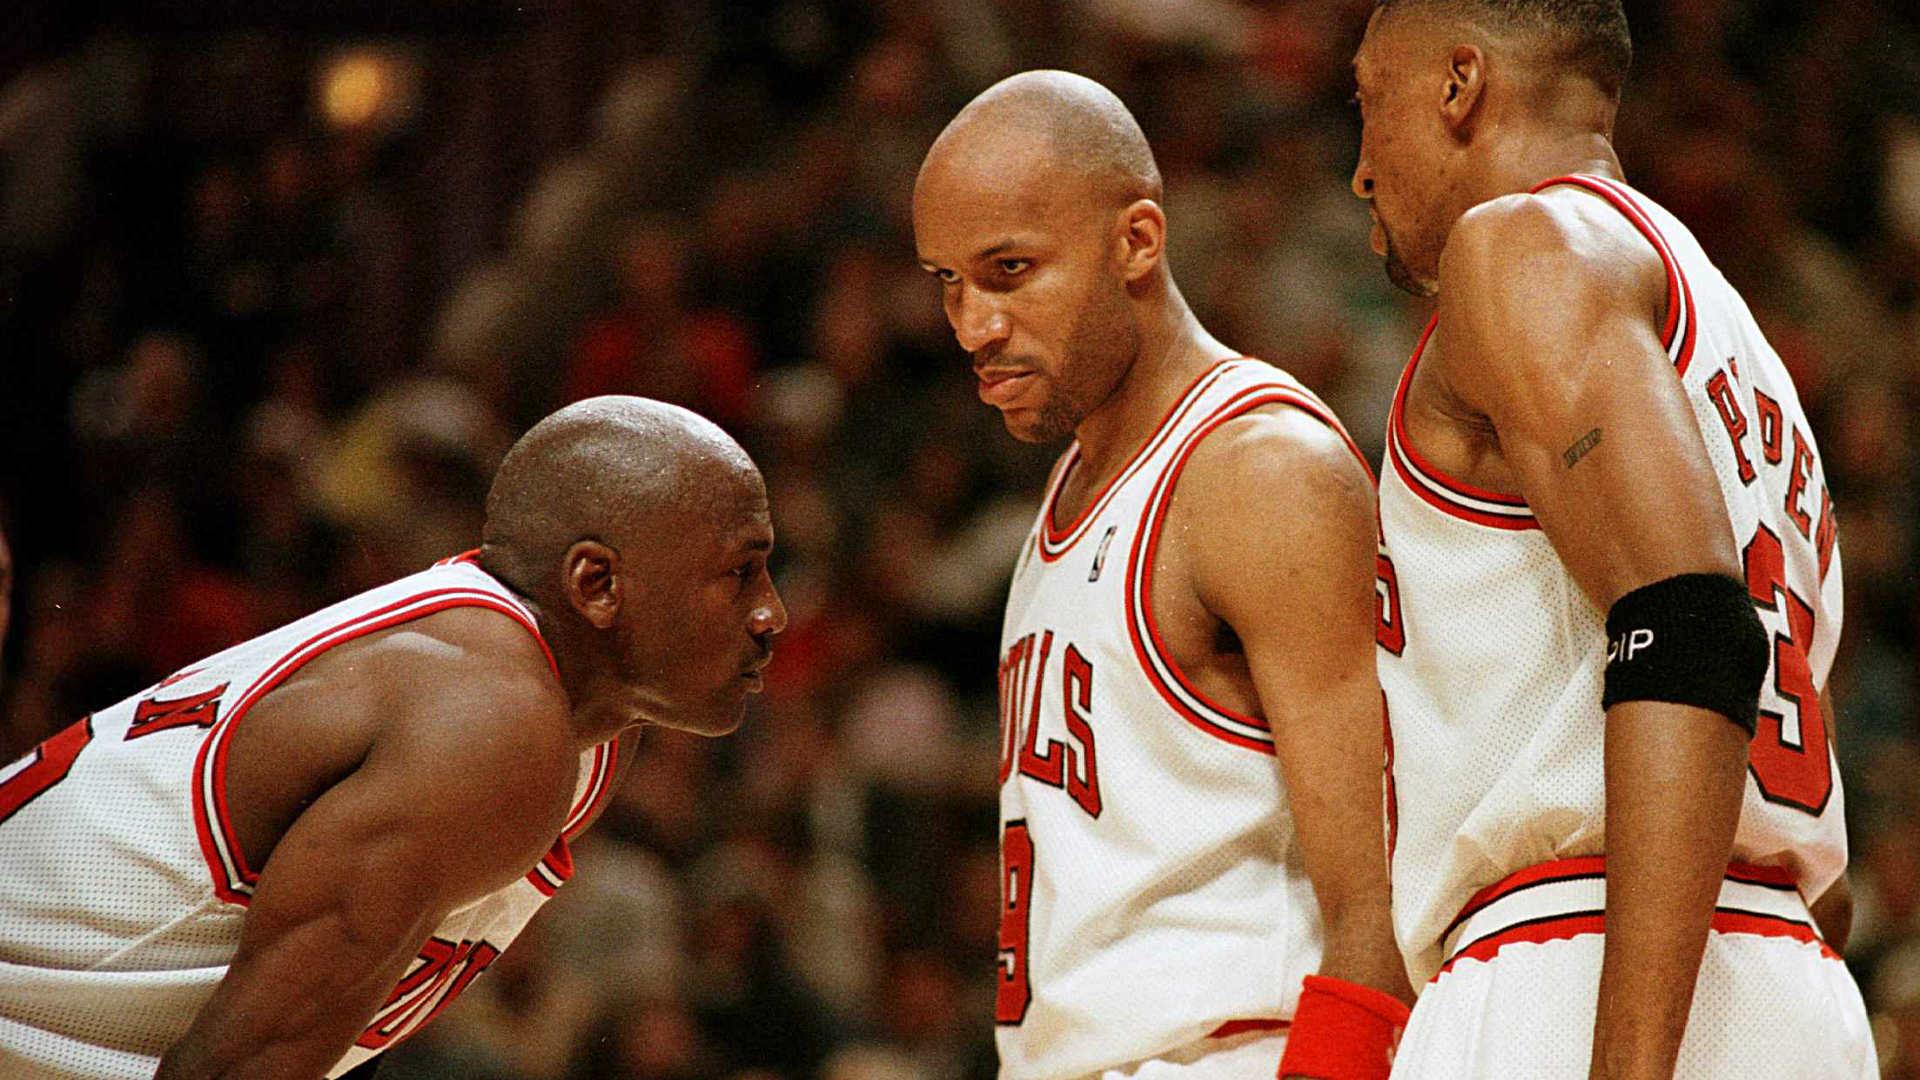 'NBA Jam' creator admits he gave Pistons key advantage over Bulls